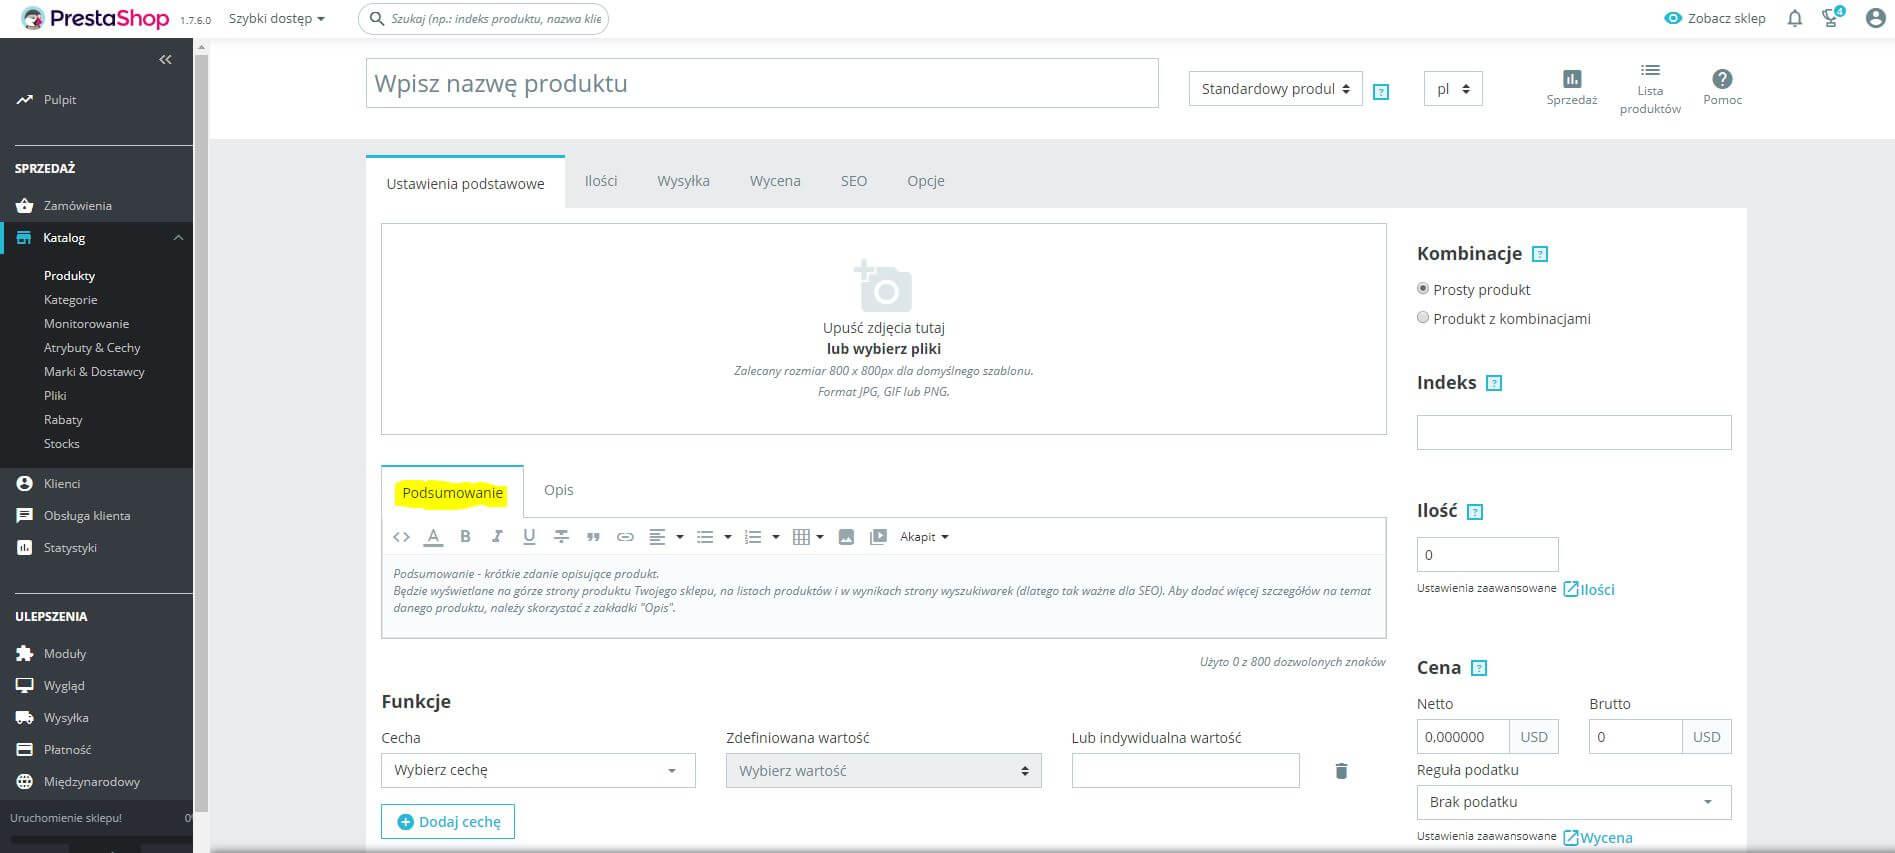 podsumowanie produktu prestashop 1.7